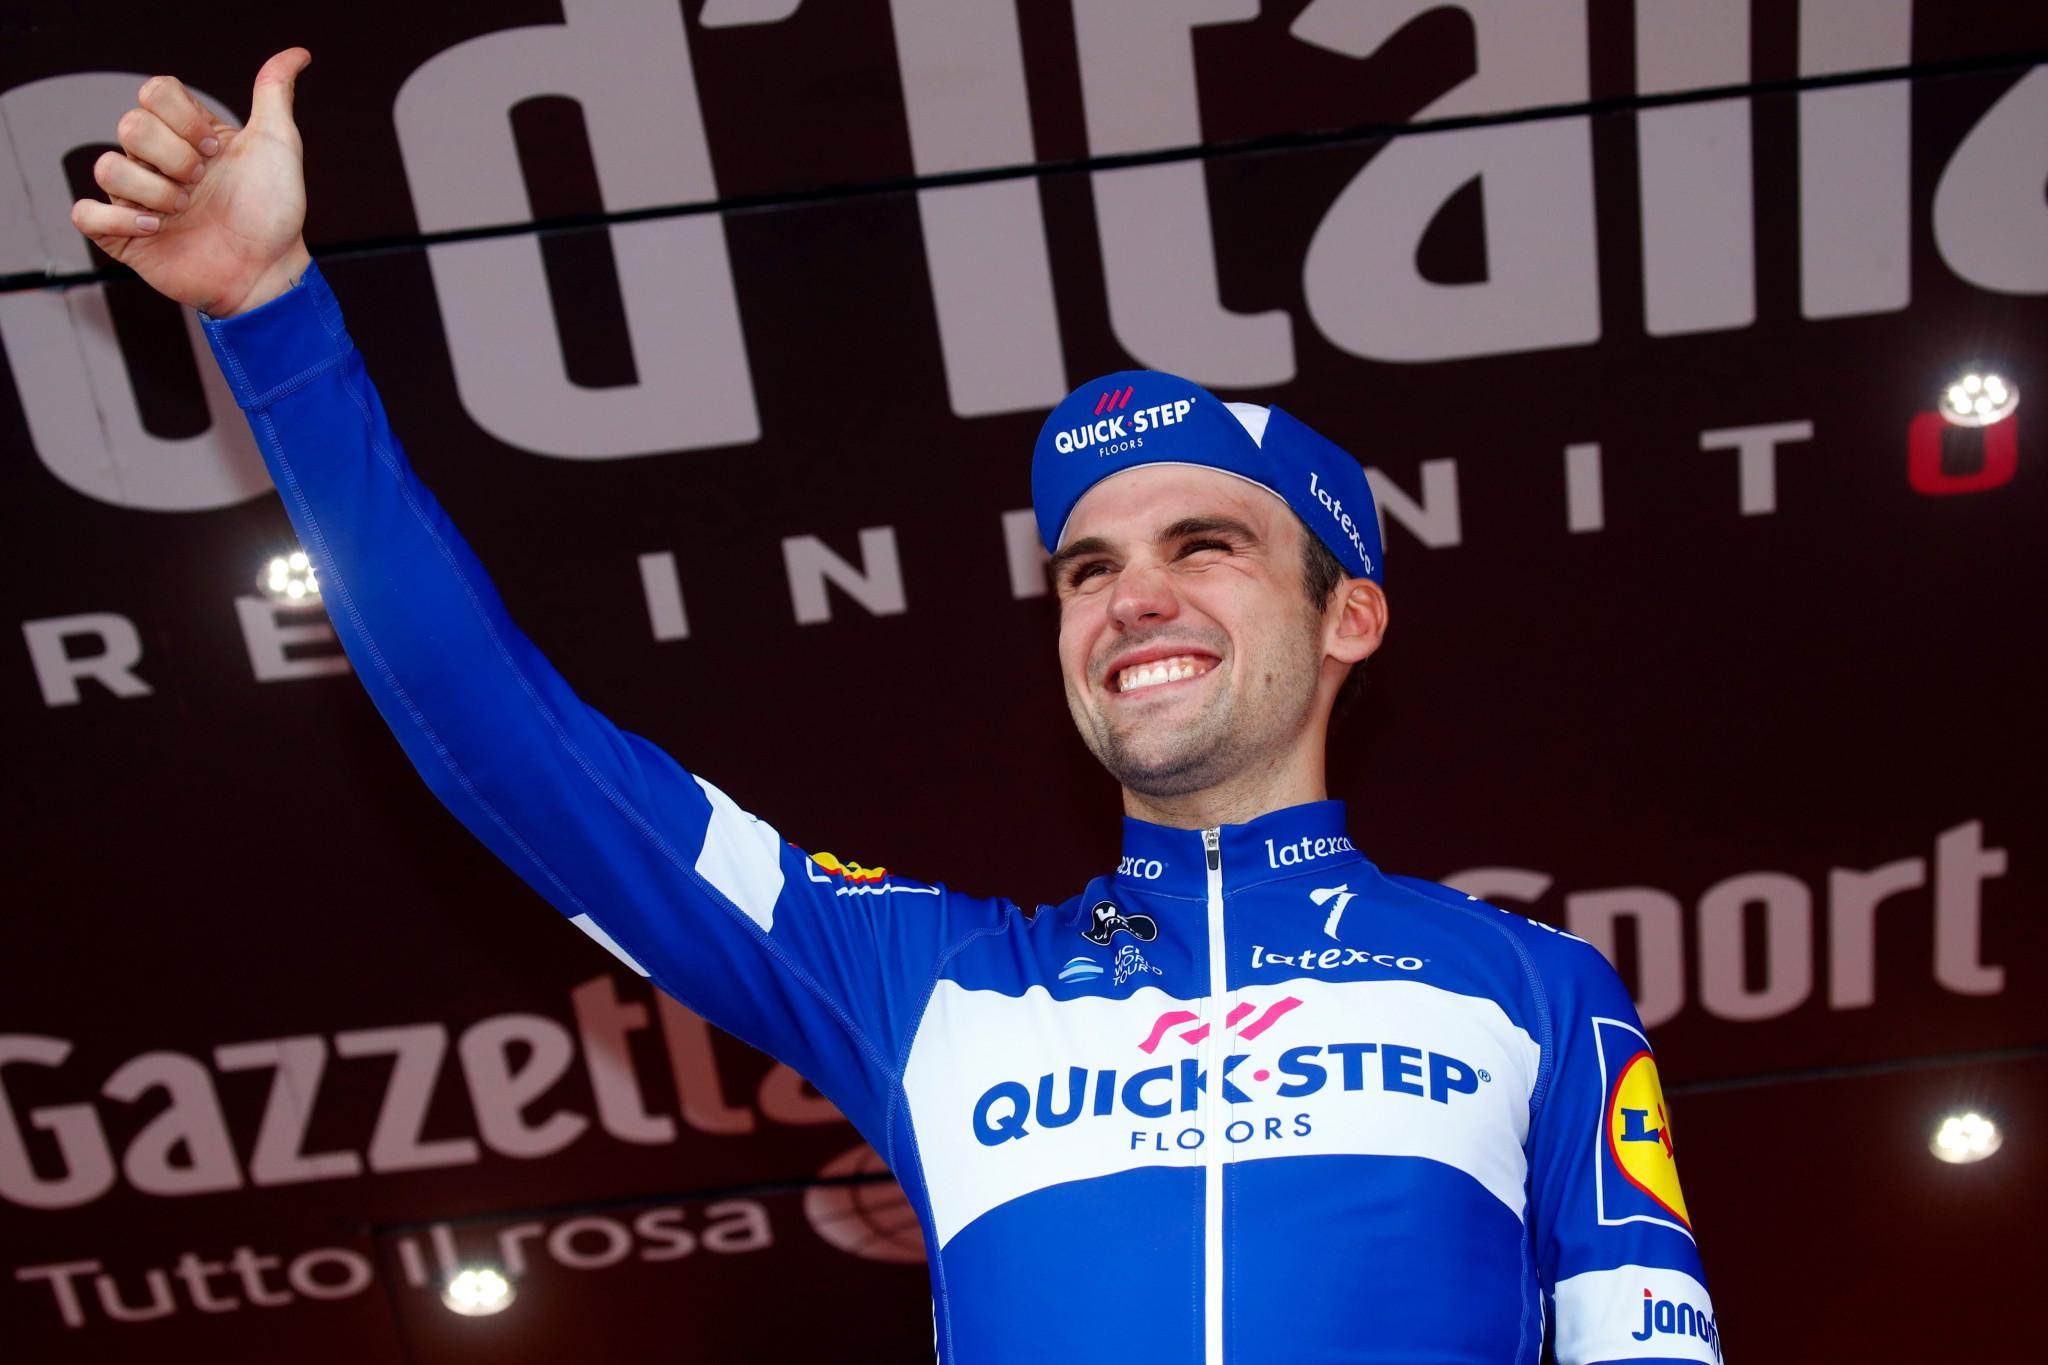 Yates lead cut in half as Schachmann wins stage 18 at Giro d'Italia